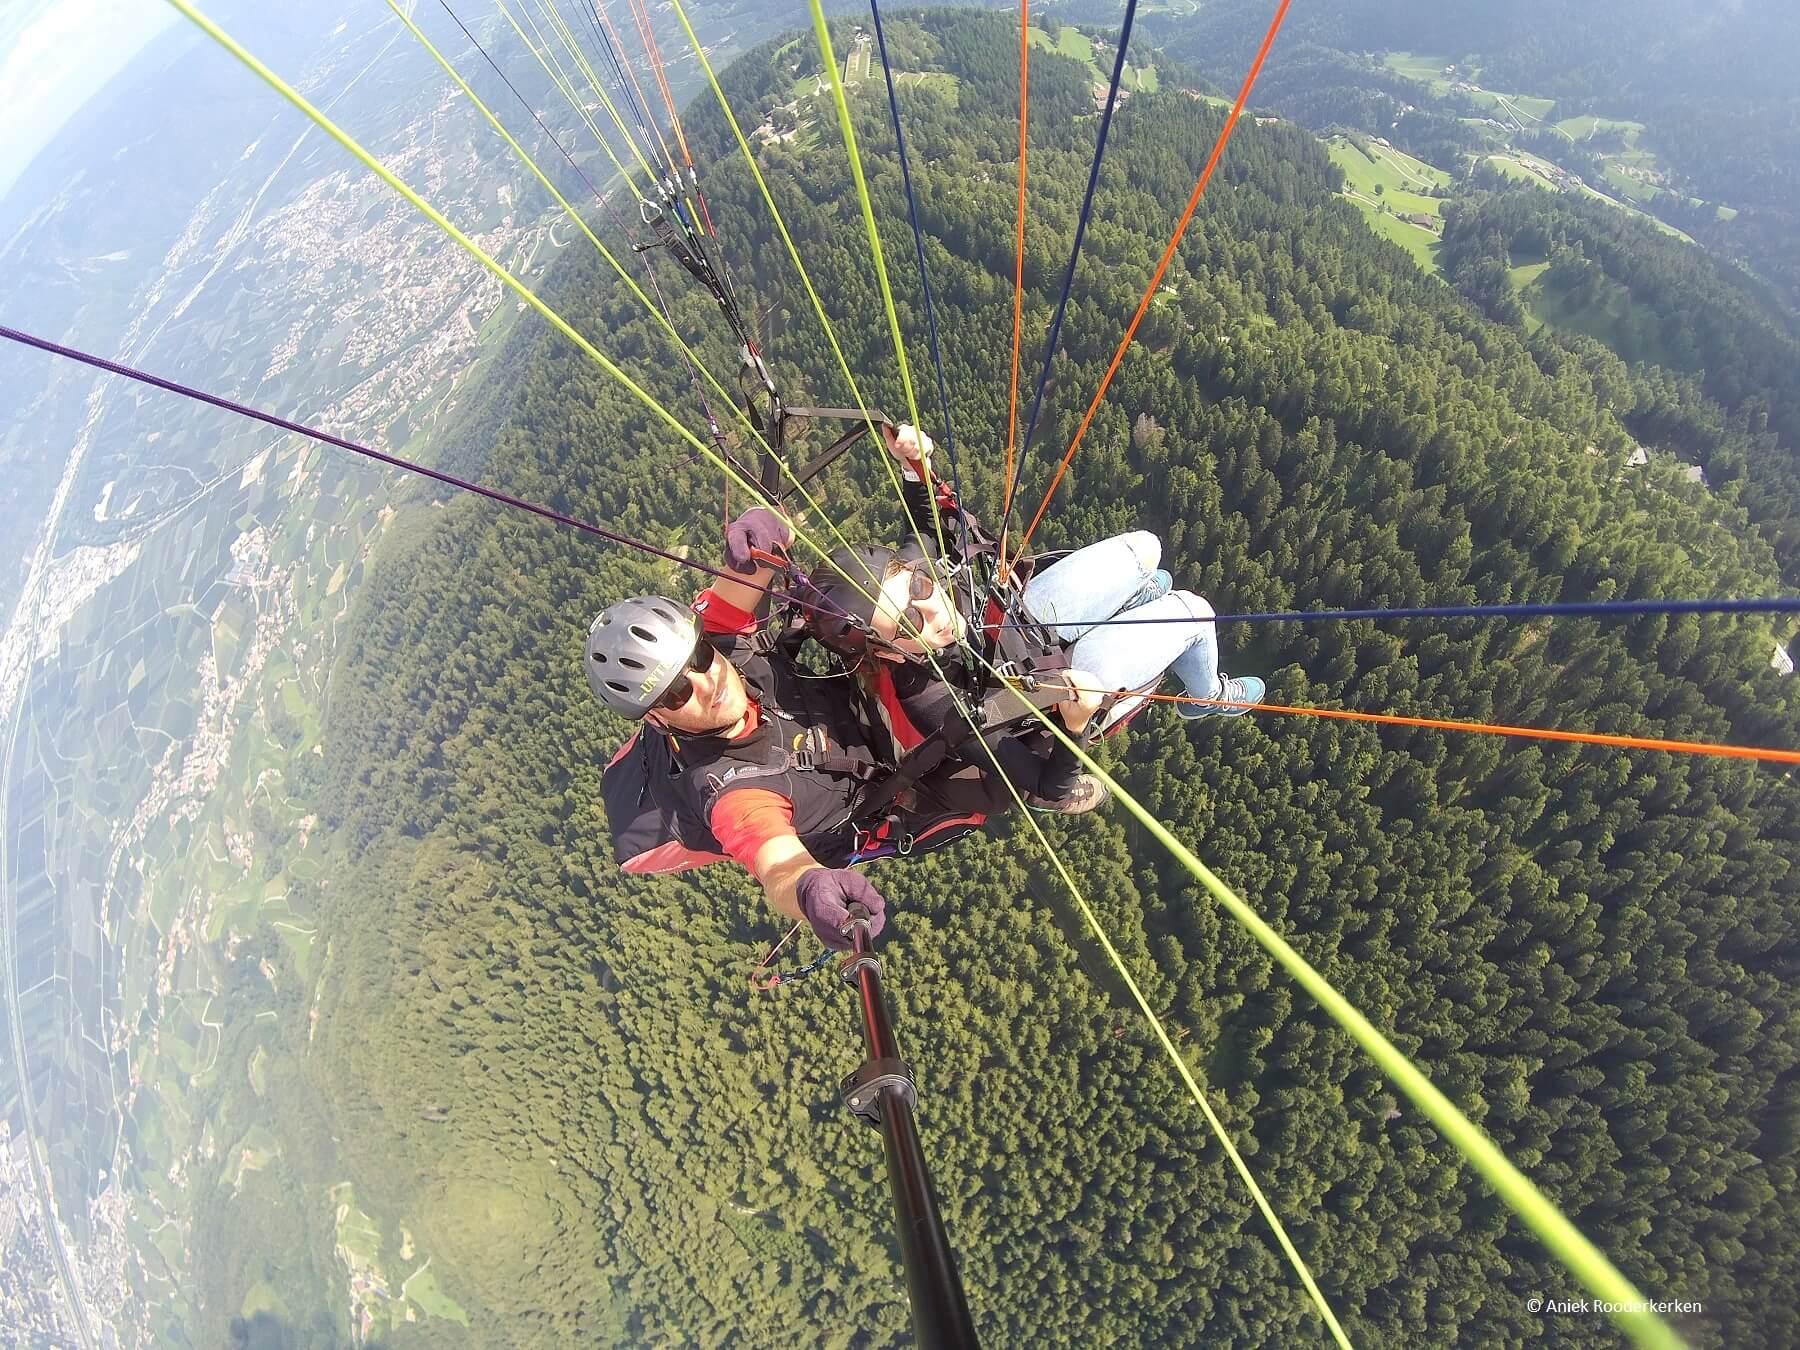 Paragliding in Zuid-Tirol